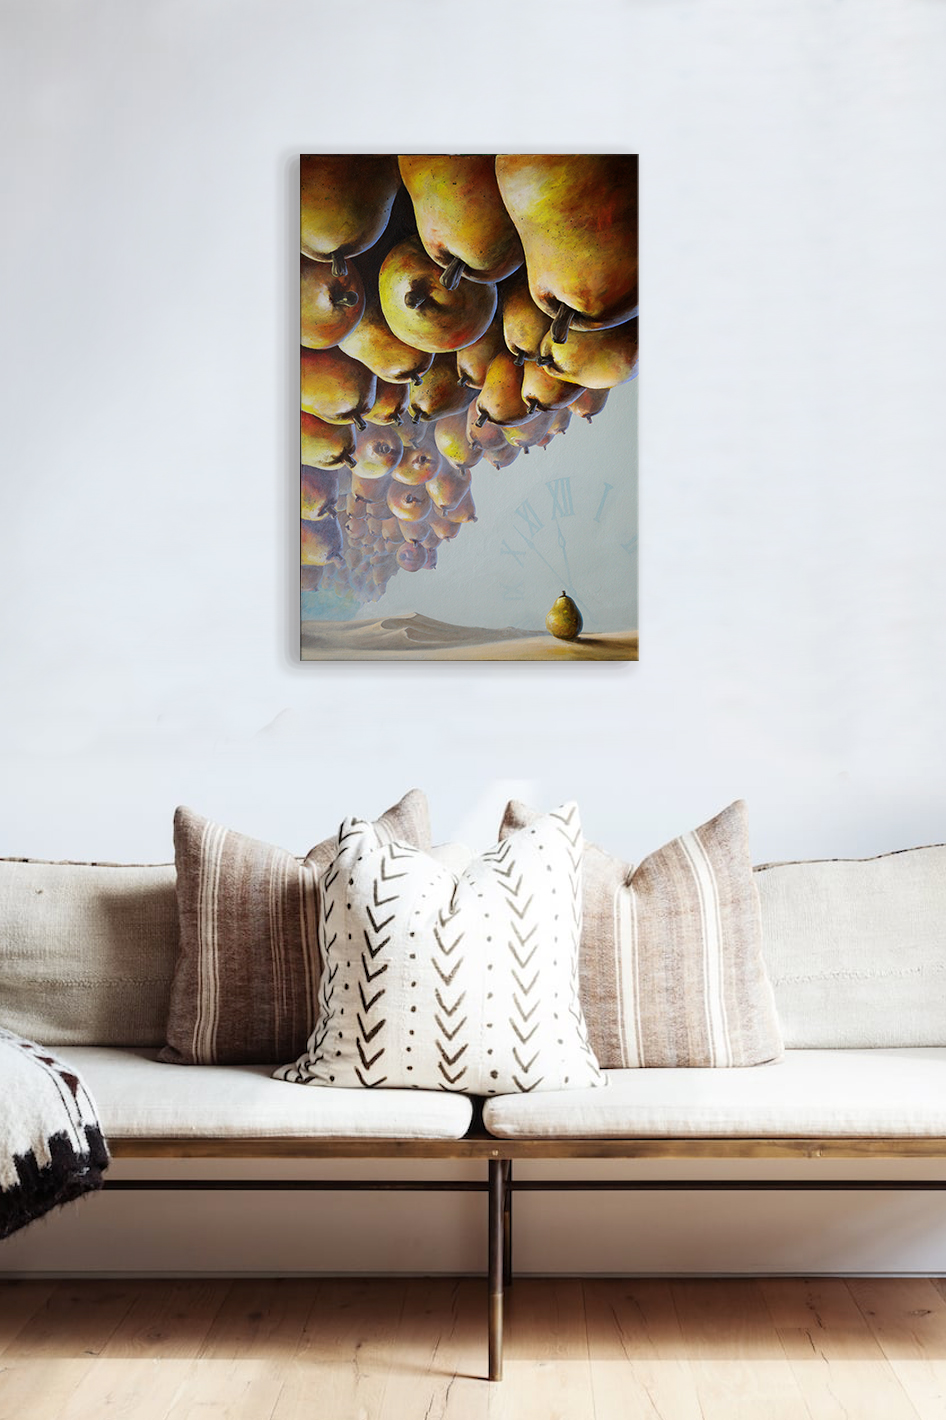 interior-design-artwork-on-wallinterior-design-artwork-on-wall-times-up-bill-higginson.jpg